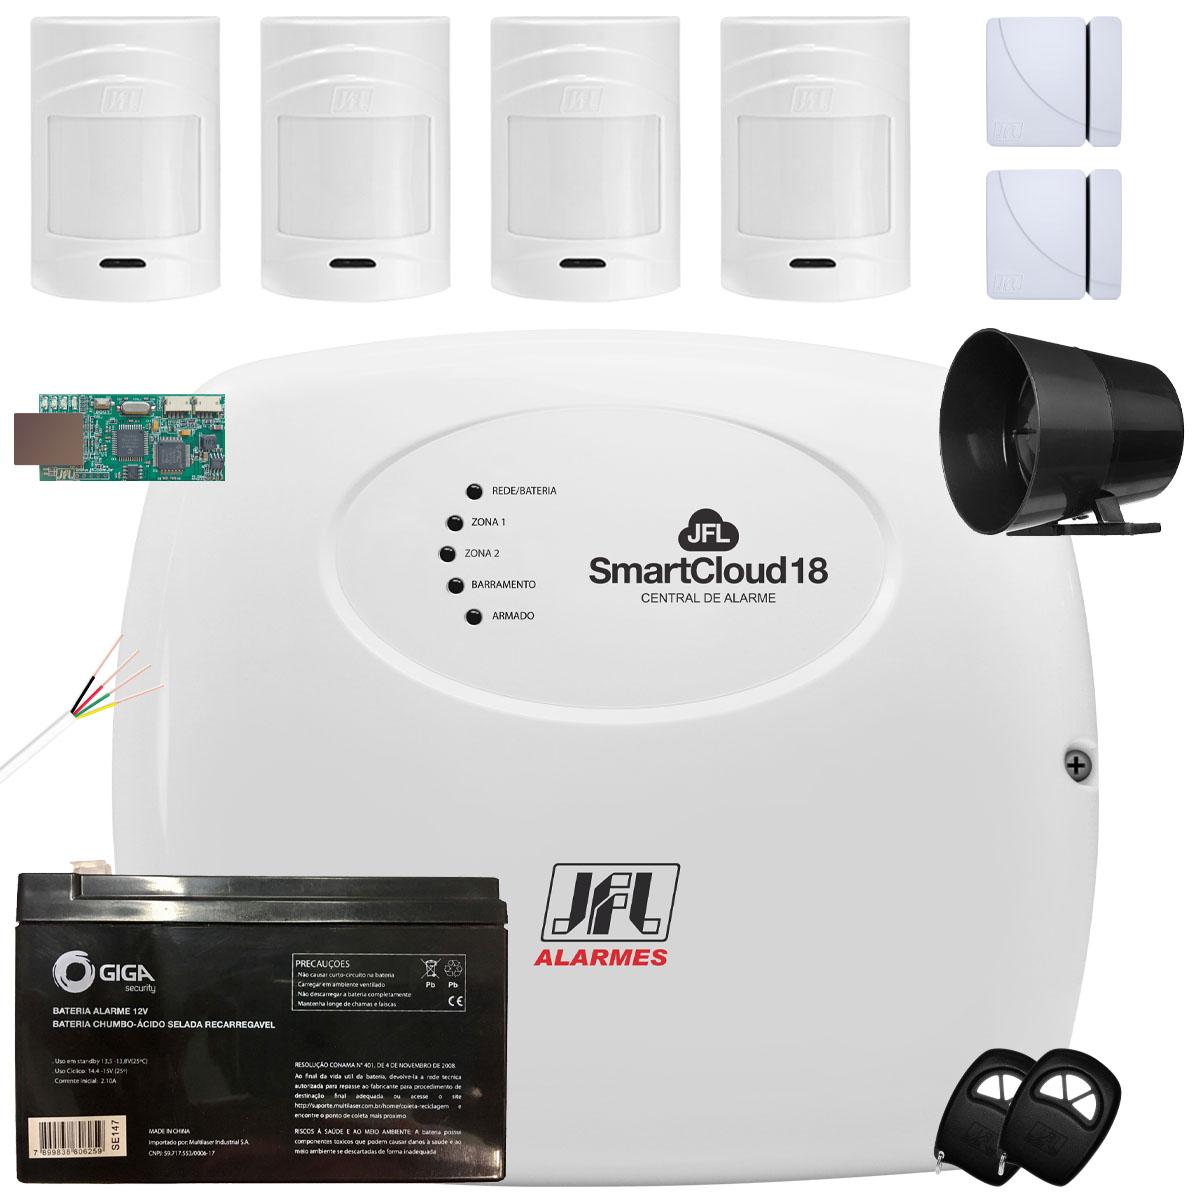 Kit Alarme Residencial SmartCloud 18 Jfl Sensores Shc Fit e IrPet 530sf